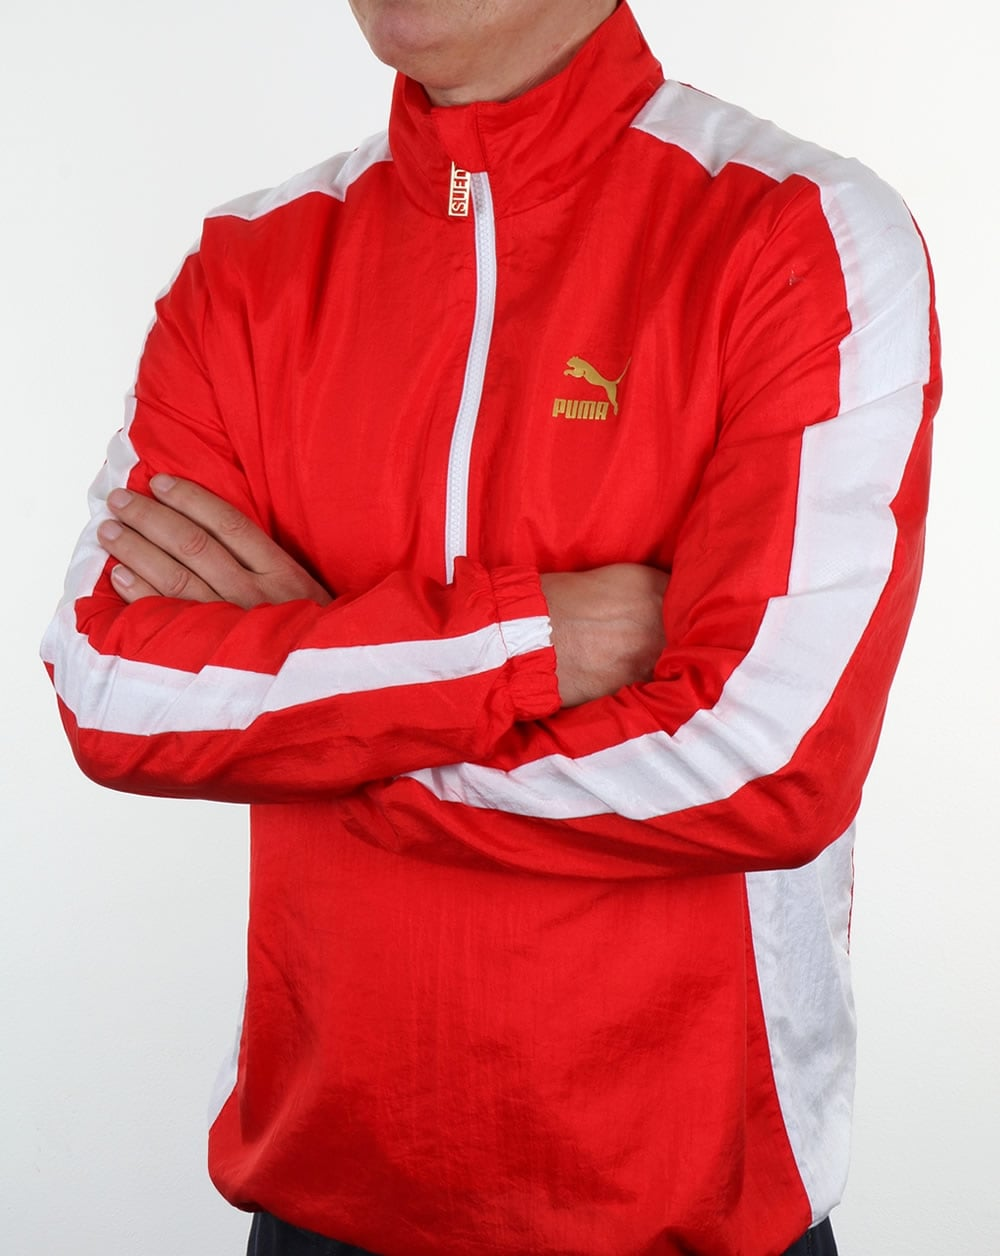 Puma T7 Bboy Track Jacket Red White Savannah Break Dance